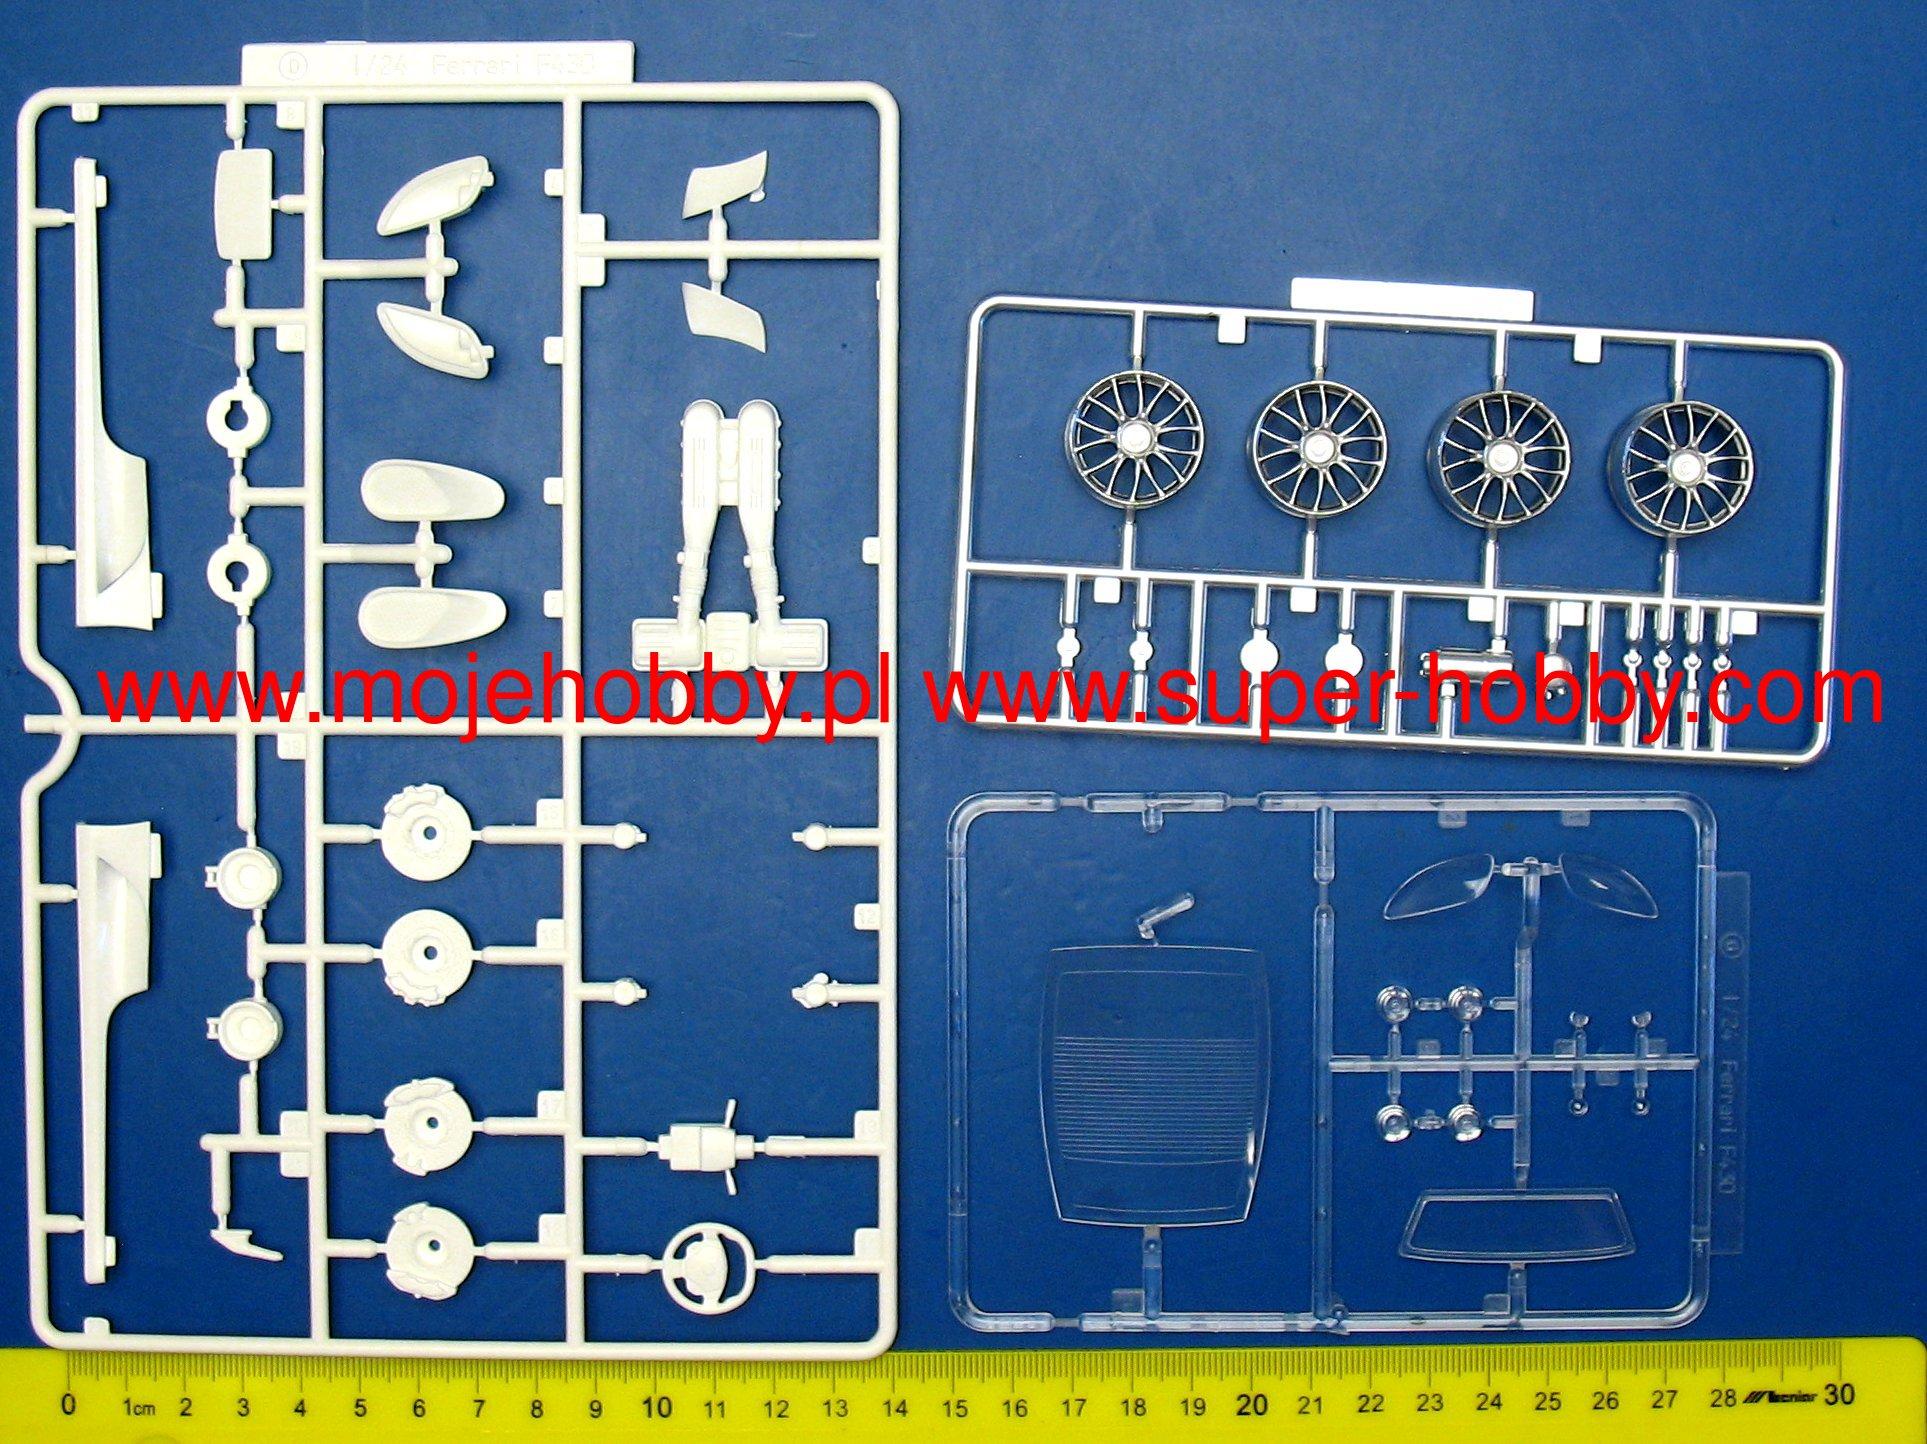 hight resolution of  ferrari f430 challenge fujimi 126364 on ferrari 599 gtb fiorano ferrari 456 gta ferrari genuine ferrari f430 challenge wiring diagrams